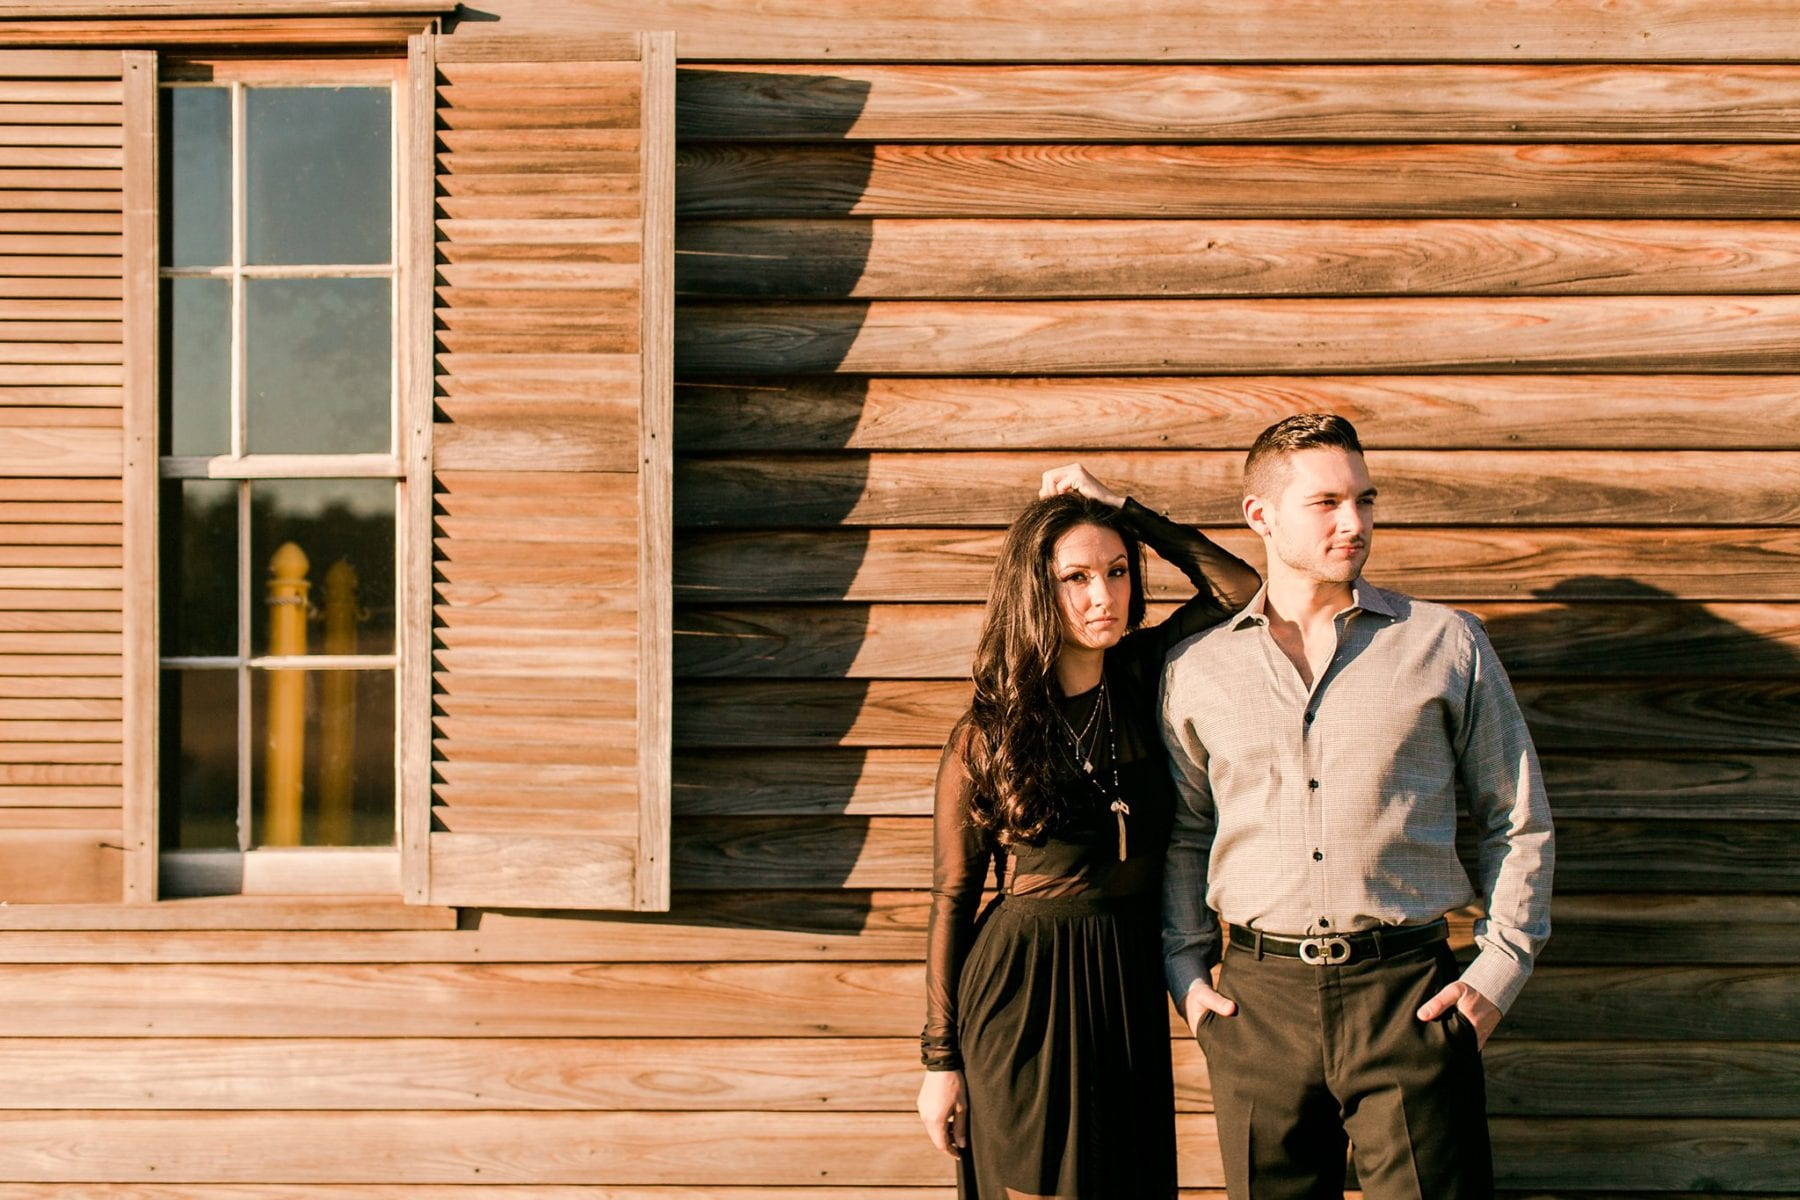 Manassas Battlefield Portraits Virginia Wedding Photographer Megan Kelsey Photography Lianne & Chris-101.jpg